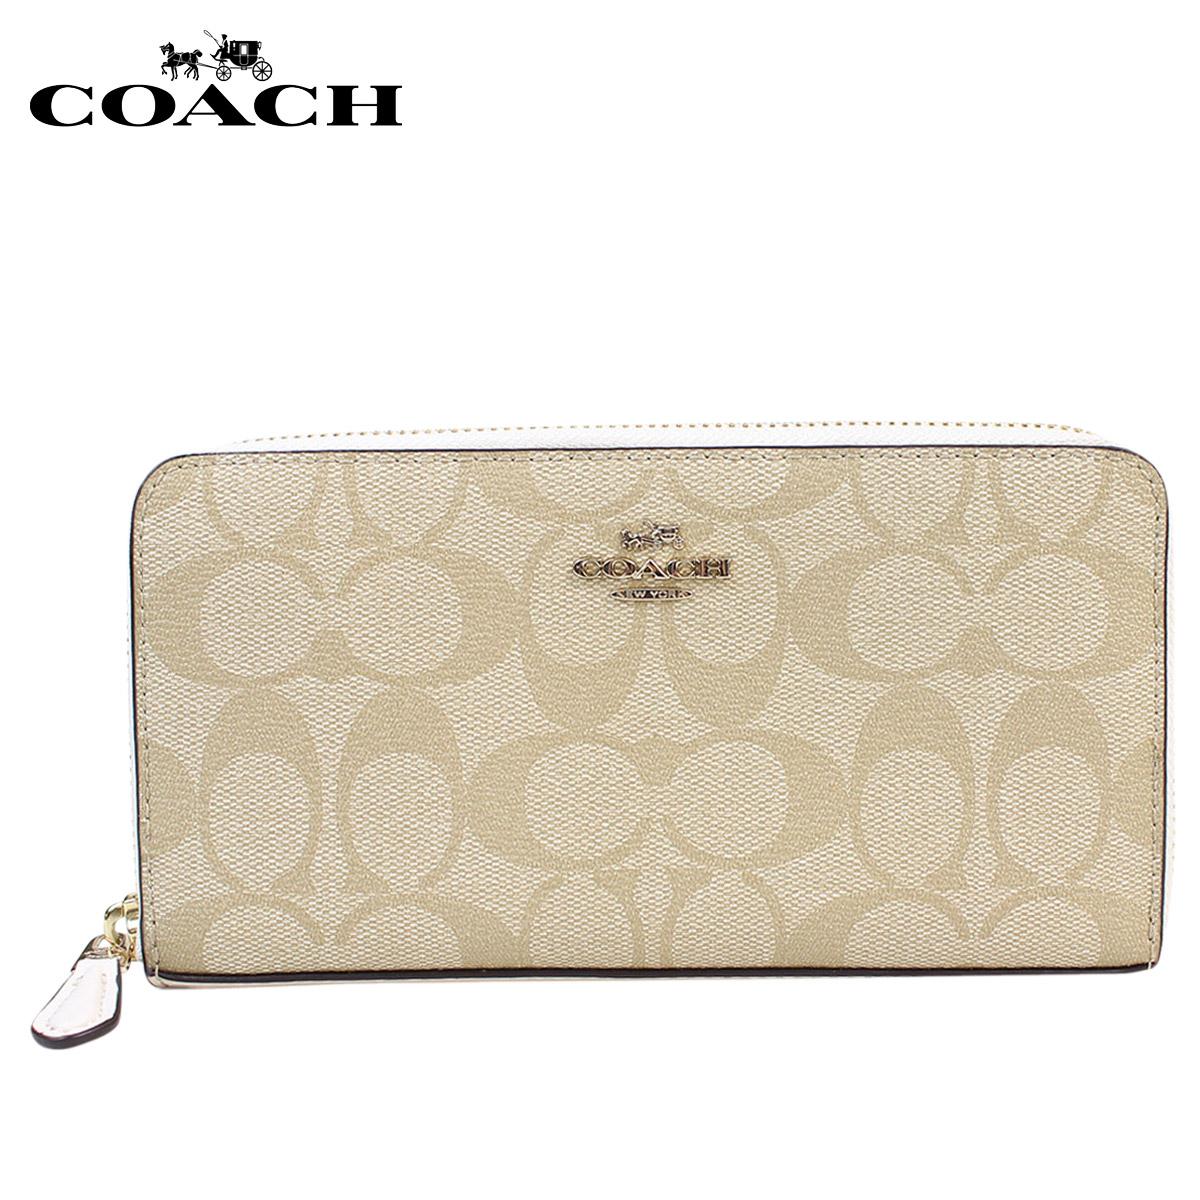 lowest price 7d531 56bdf Coach wallet COACH Lady's long wallet round fastener F54632 light khaki X  chalk [4/5 Shinnyu load] [174]